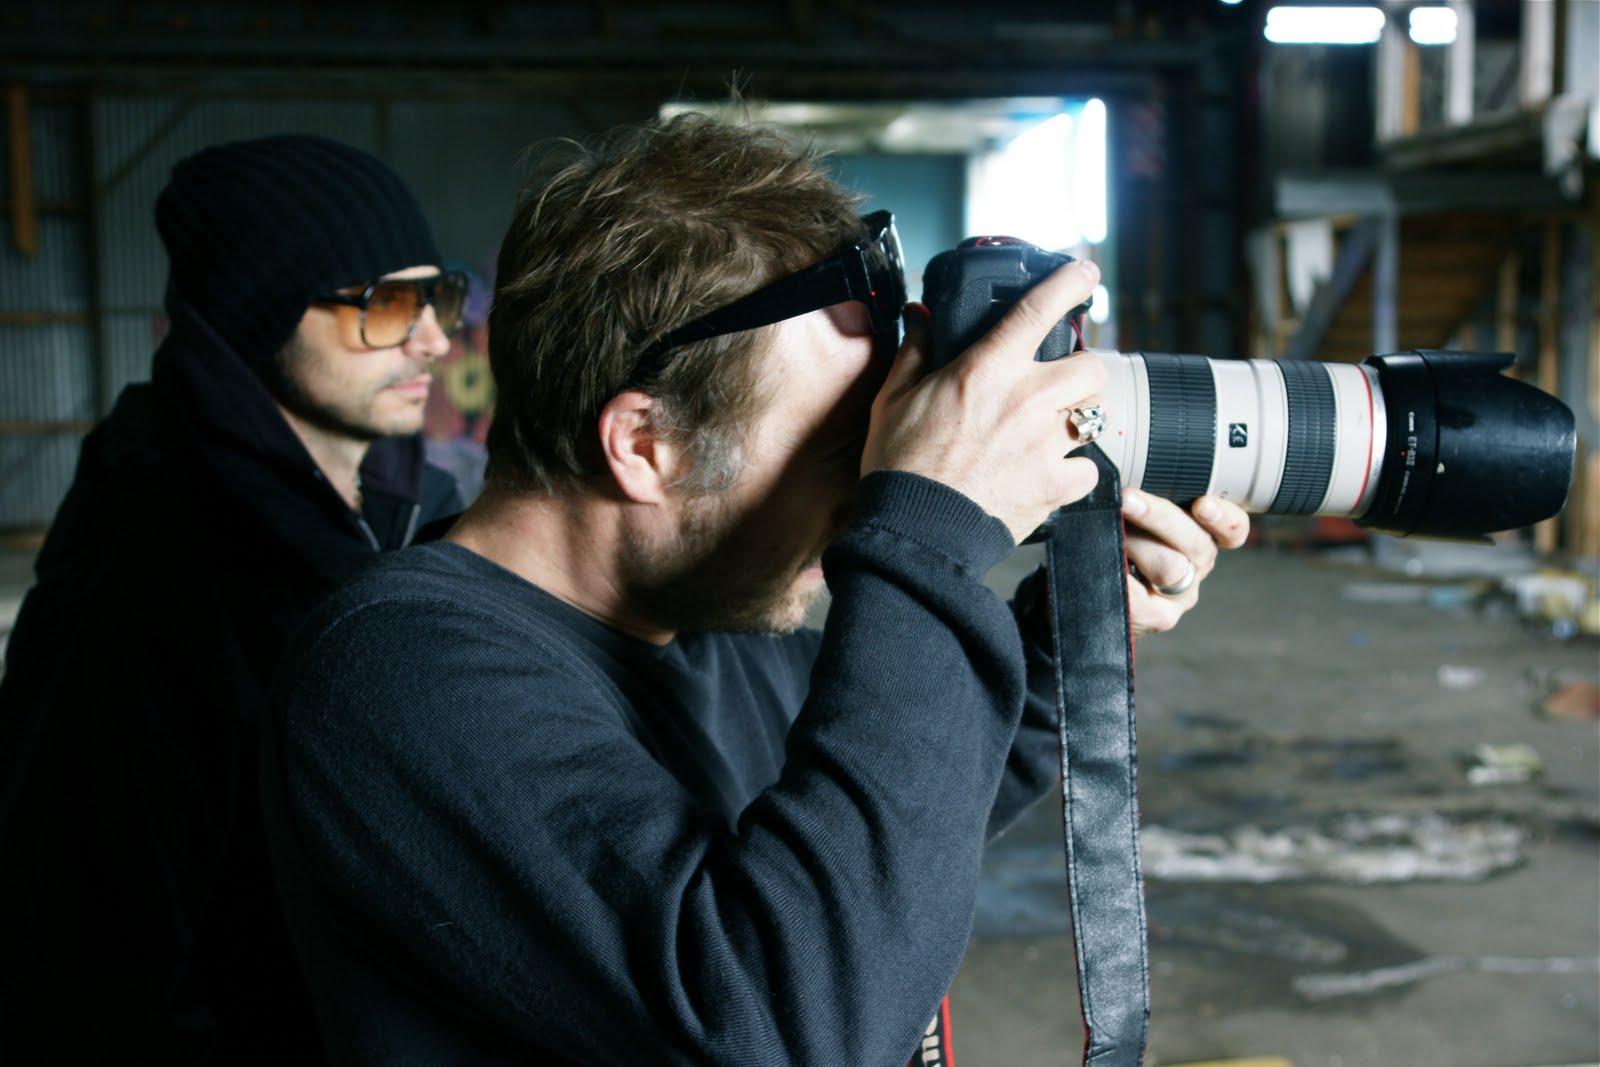 http://3.bp.blogspot.com/__jy2tSzn578/TIYBGUJ9jtI/AAAAAAAADW4/pa9_7quR6co/s1600/Greg+and+Steve.jpg